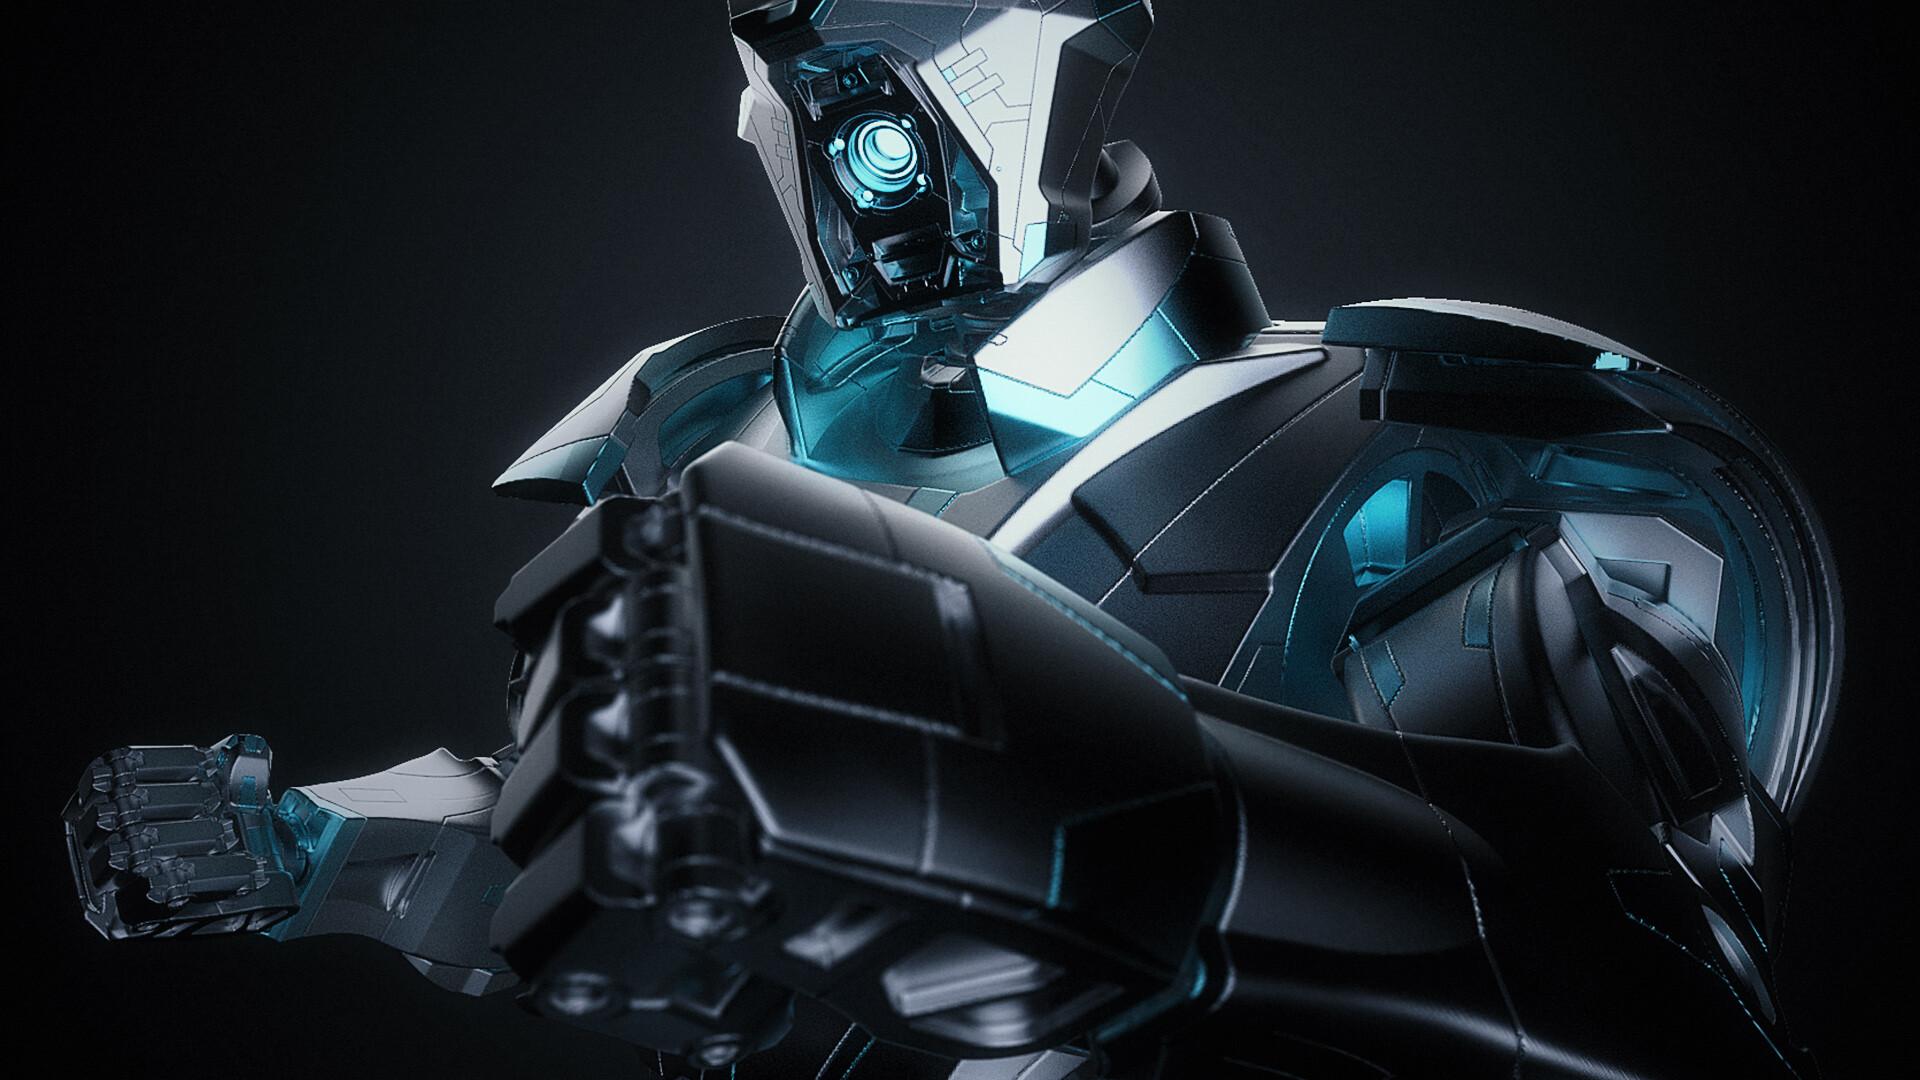 Anton tenitsky robot 001